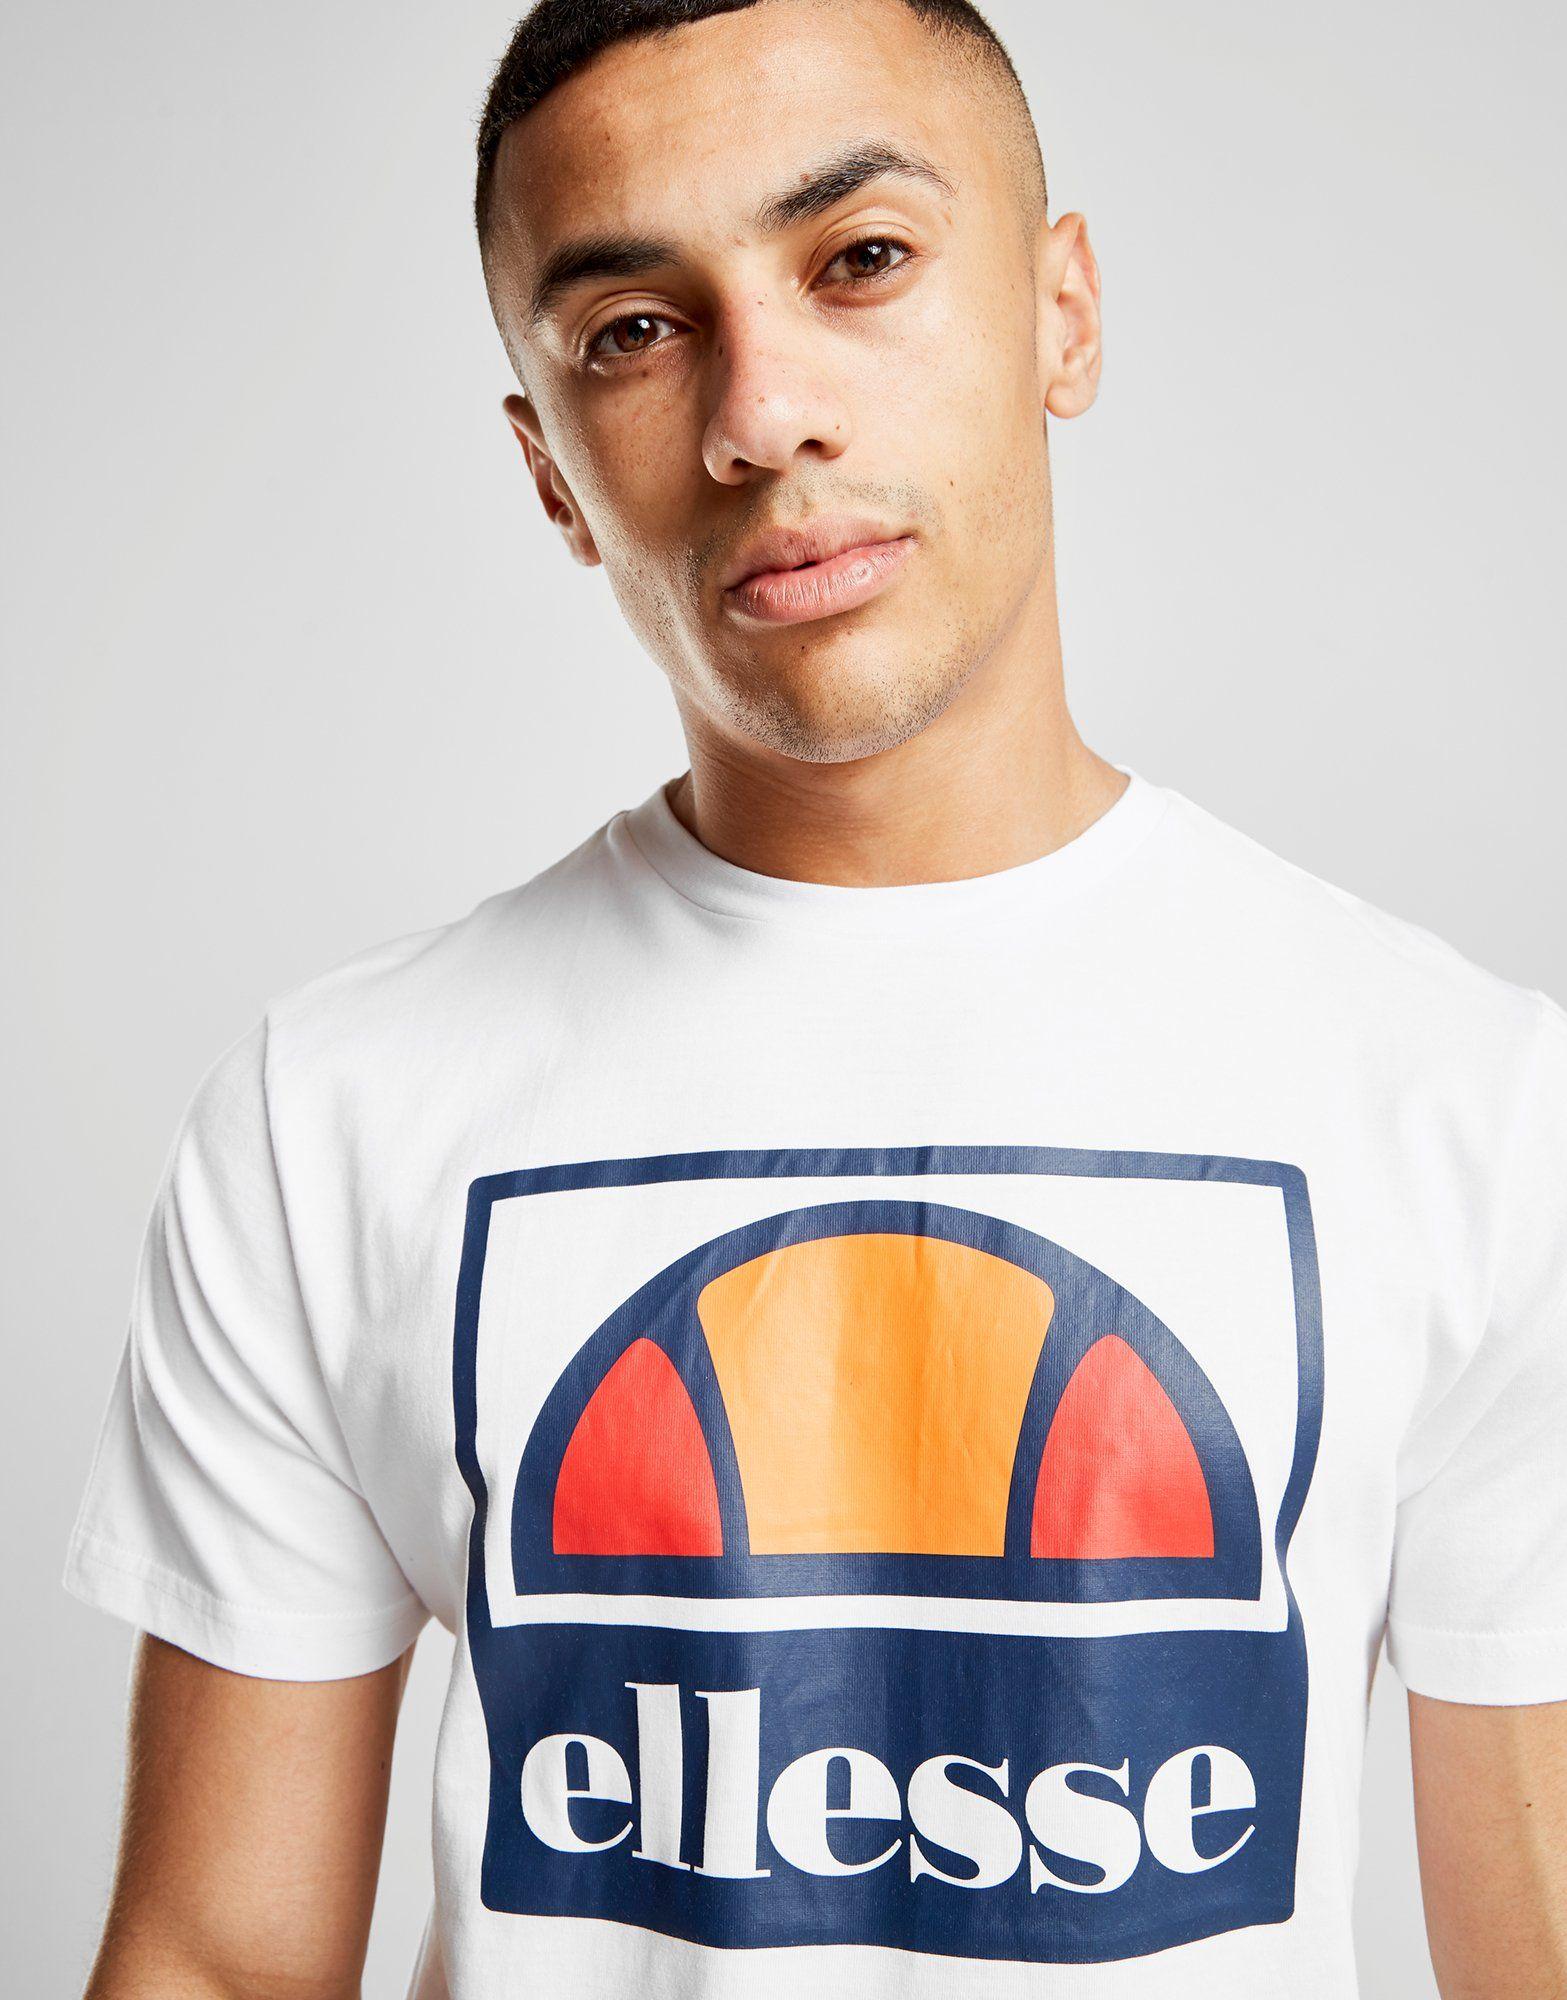 84e64fcd Ellesse T Shirts Mens Sale - Nils Stucki Kieferorthopäde